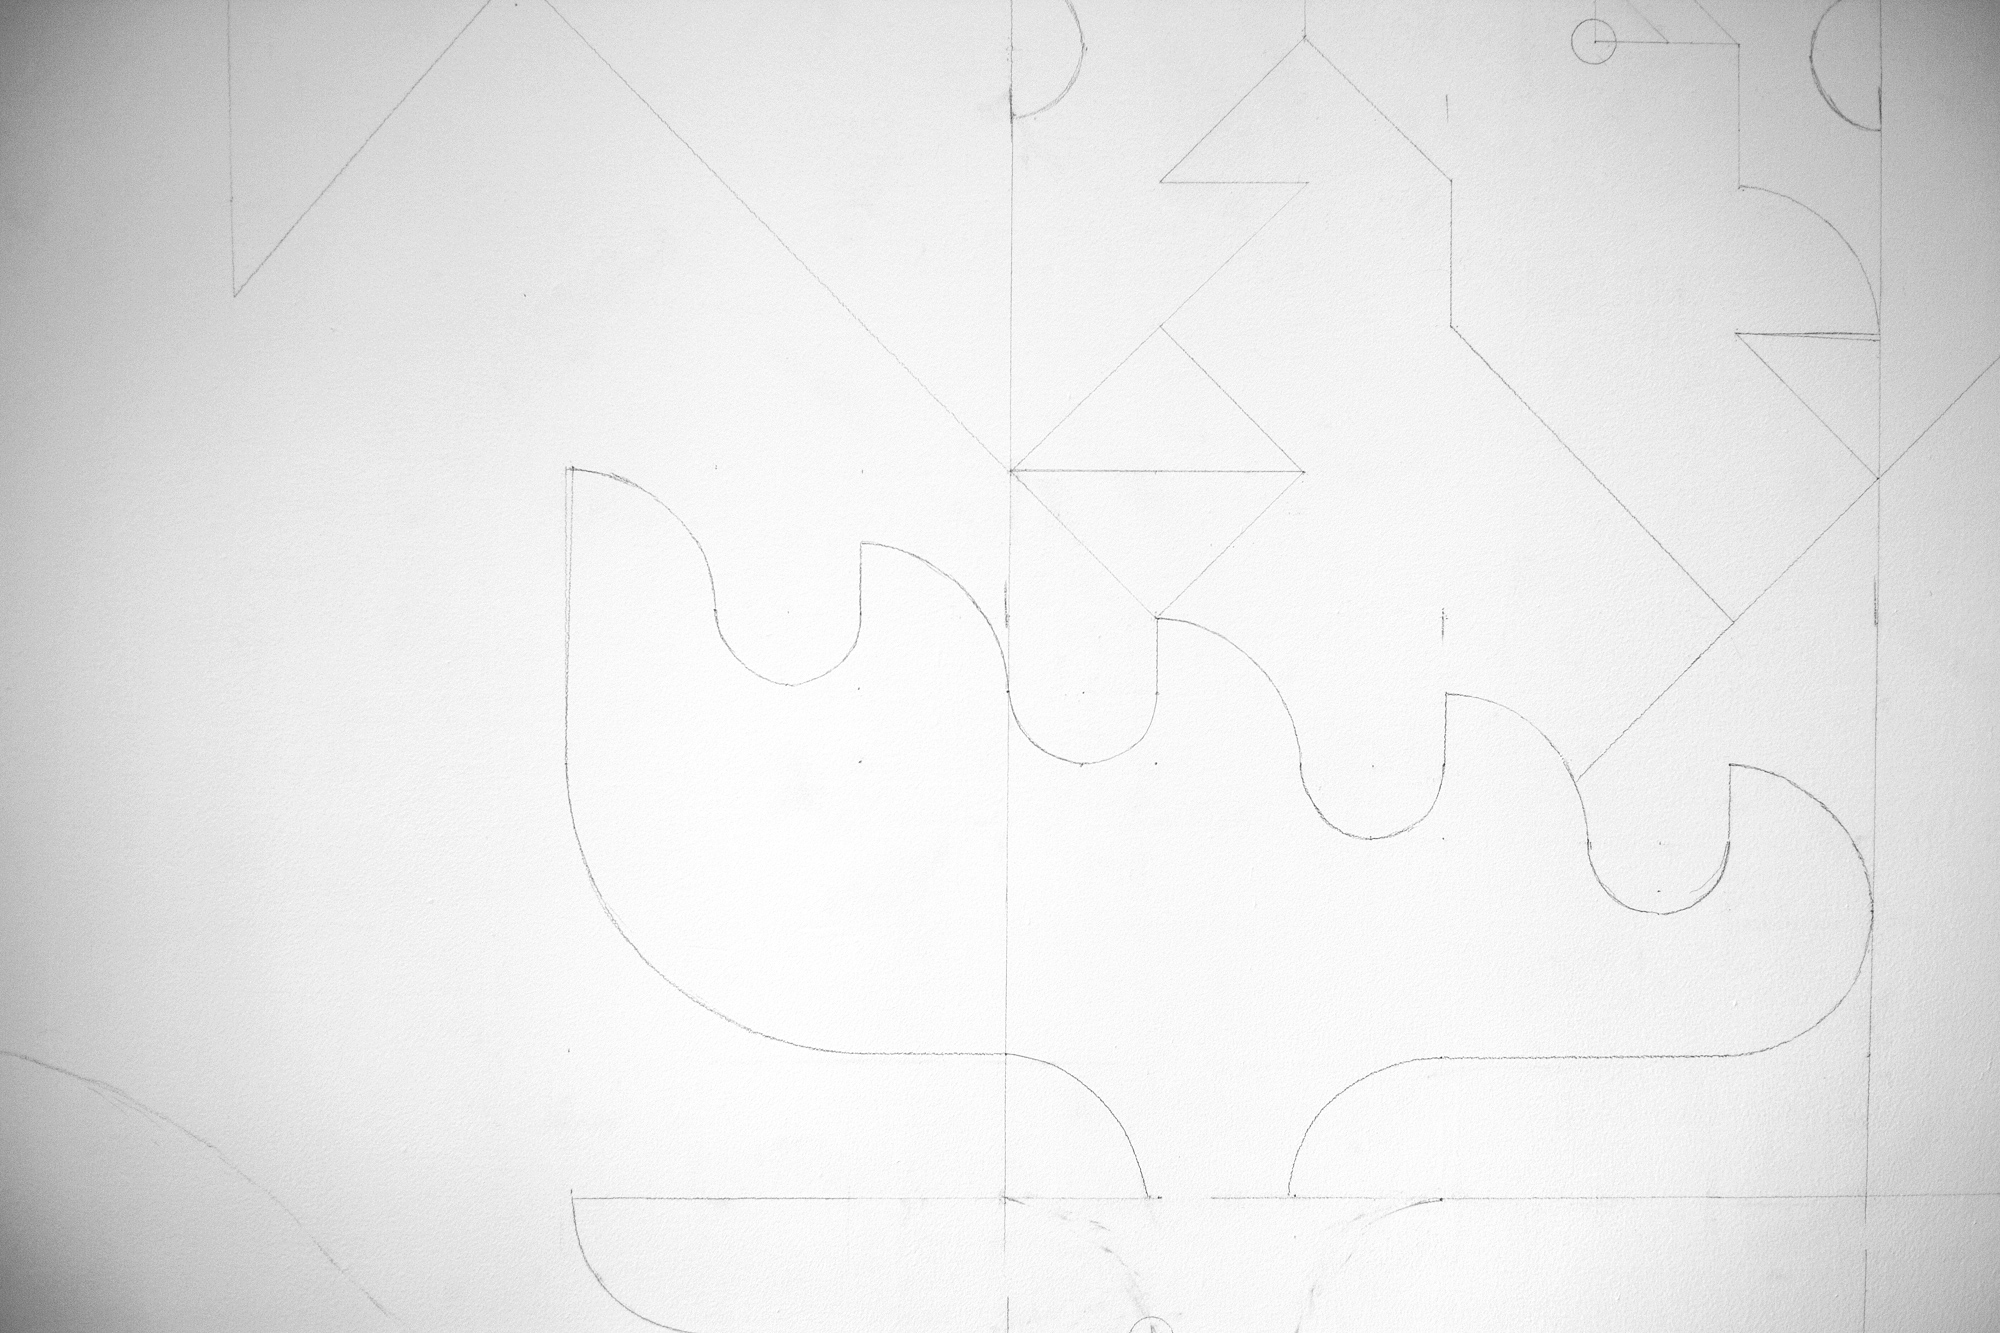 Edith-Pearl-Outlaw-Mural-Sketch.jpg